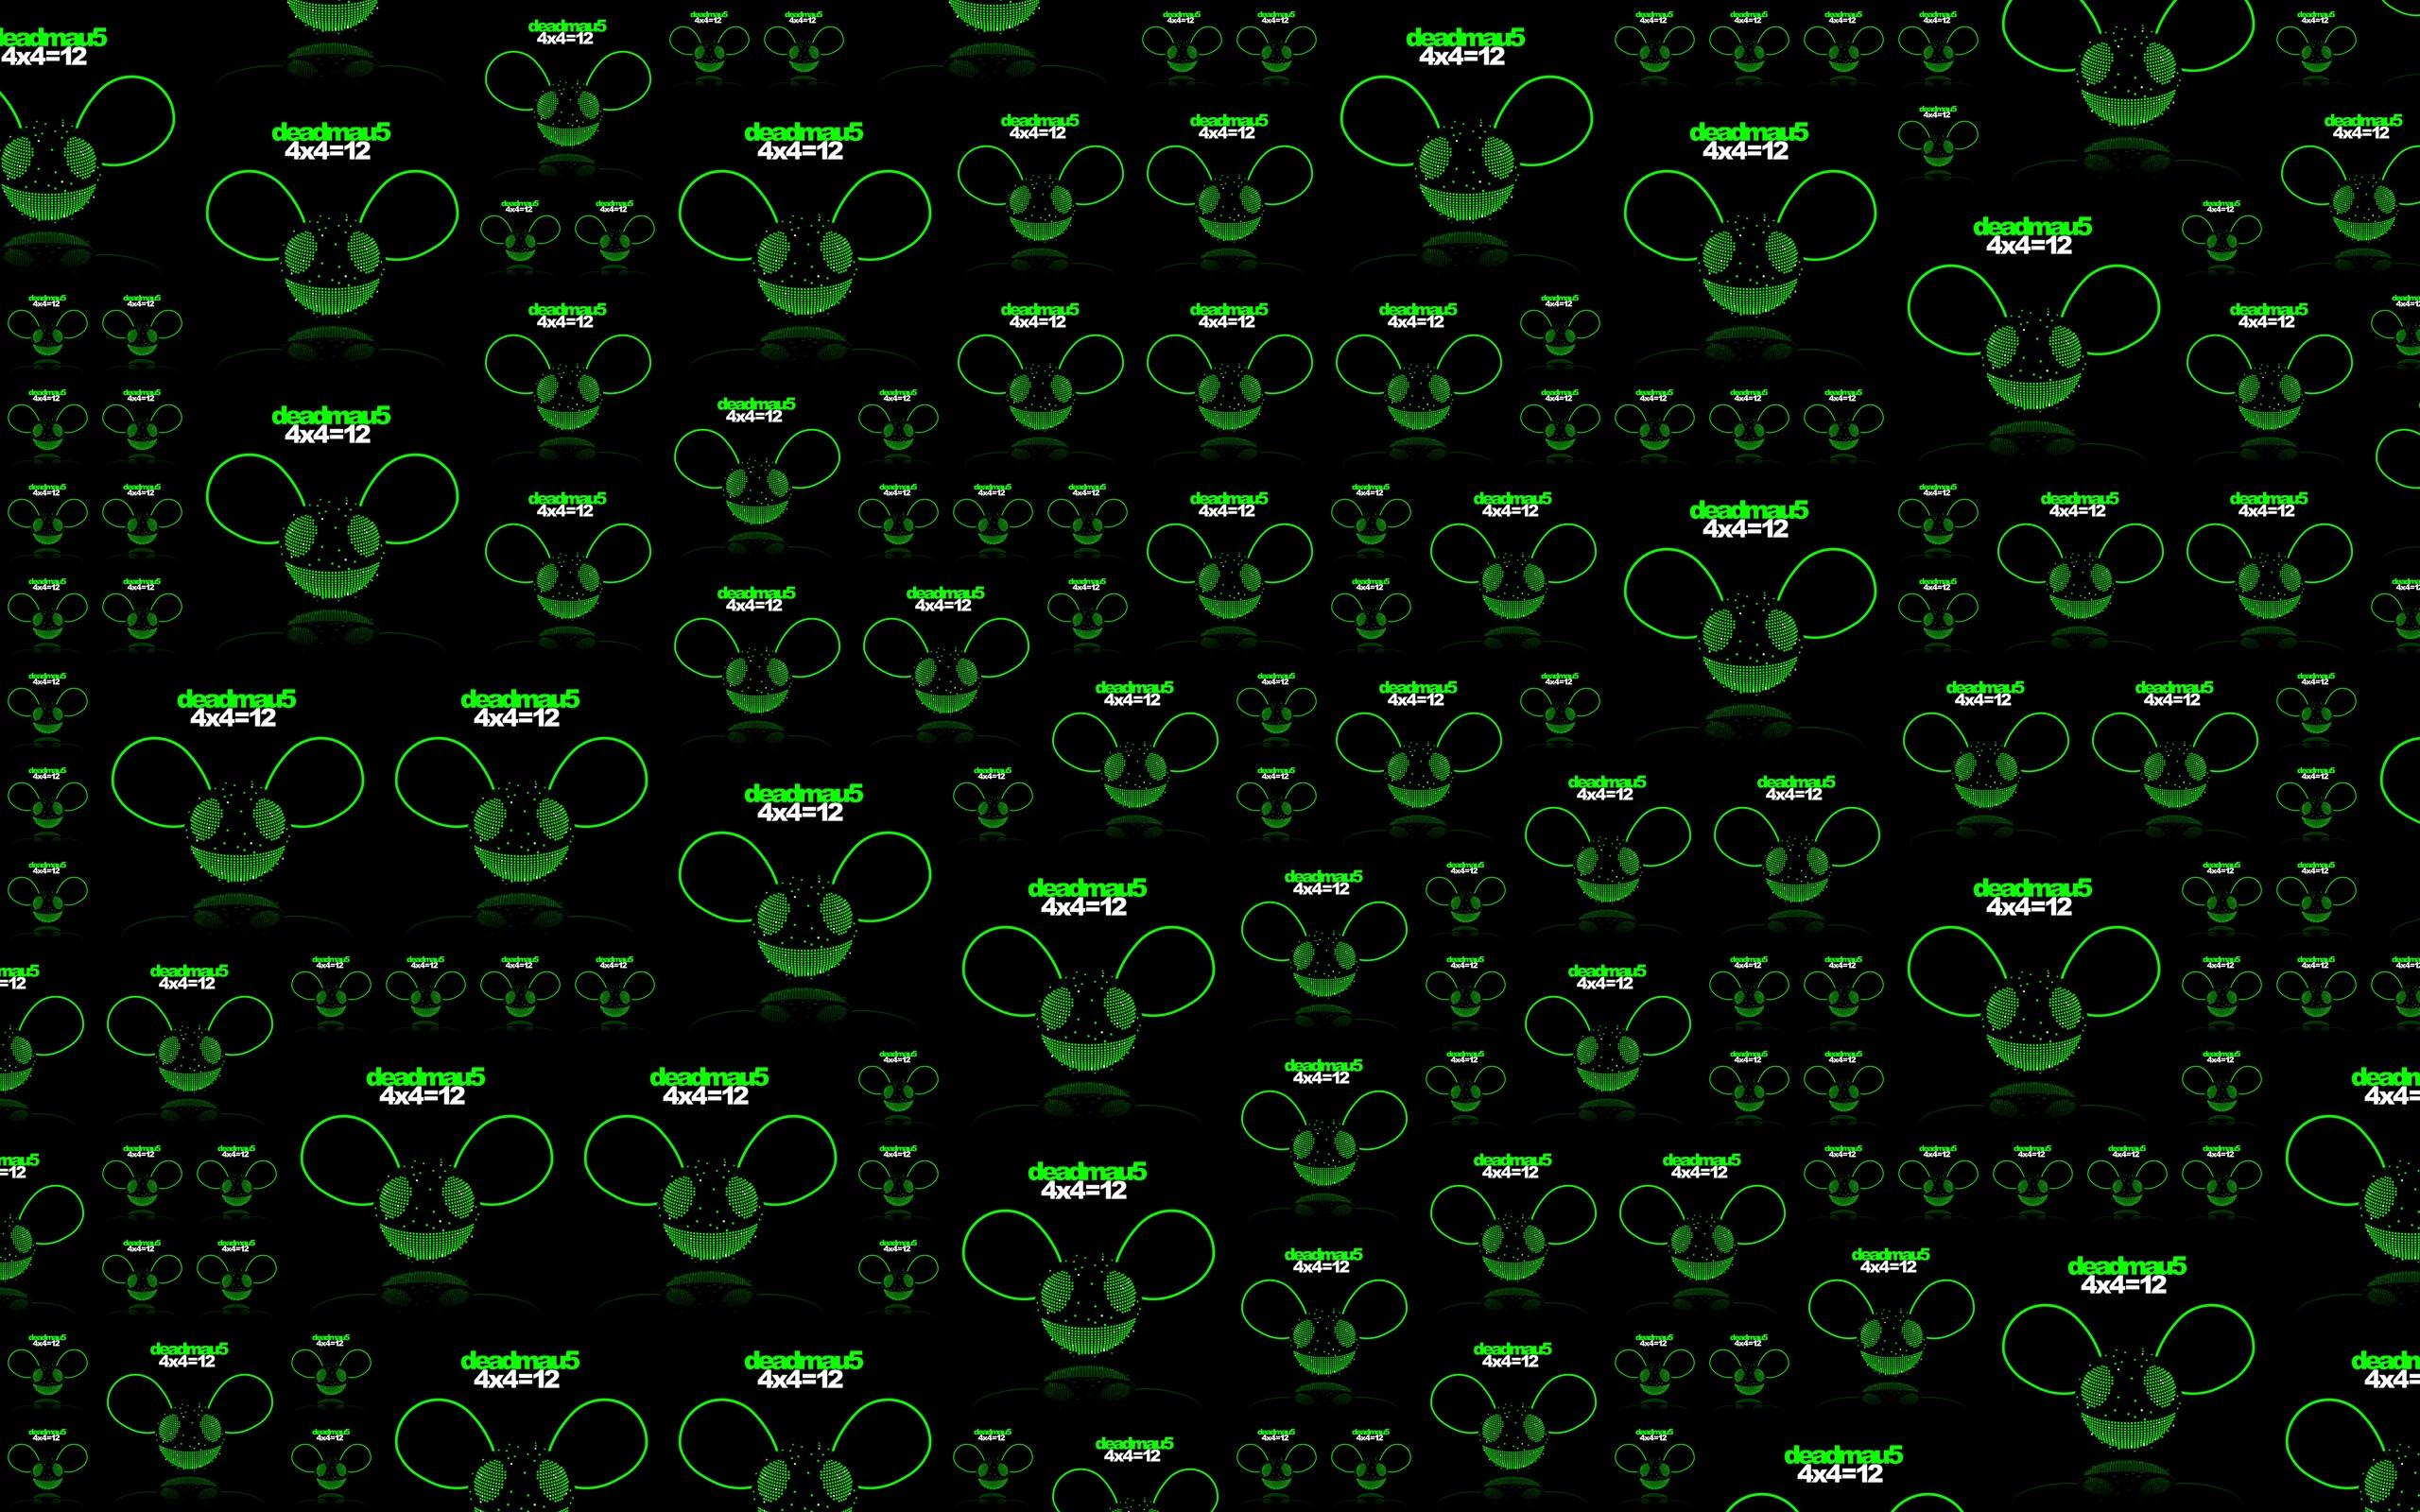 4x4 Deadmau5 Wallpapers 4x4 Deadmau5 Myspace Backgrounds 4x4 2560x1600